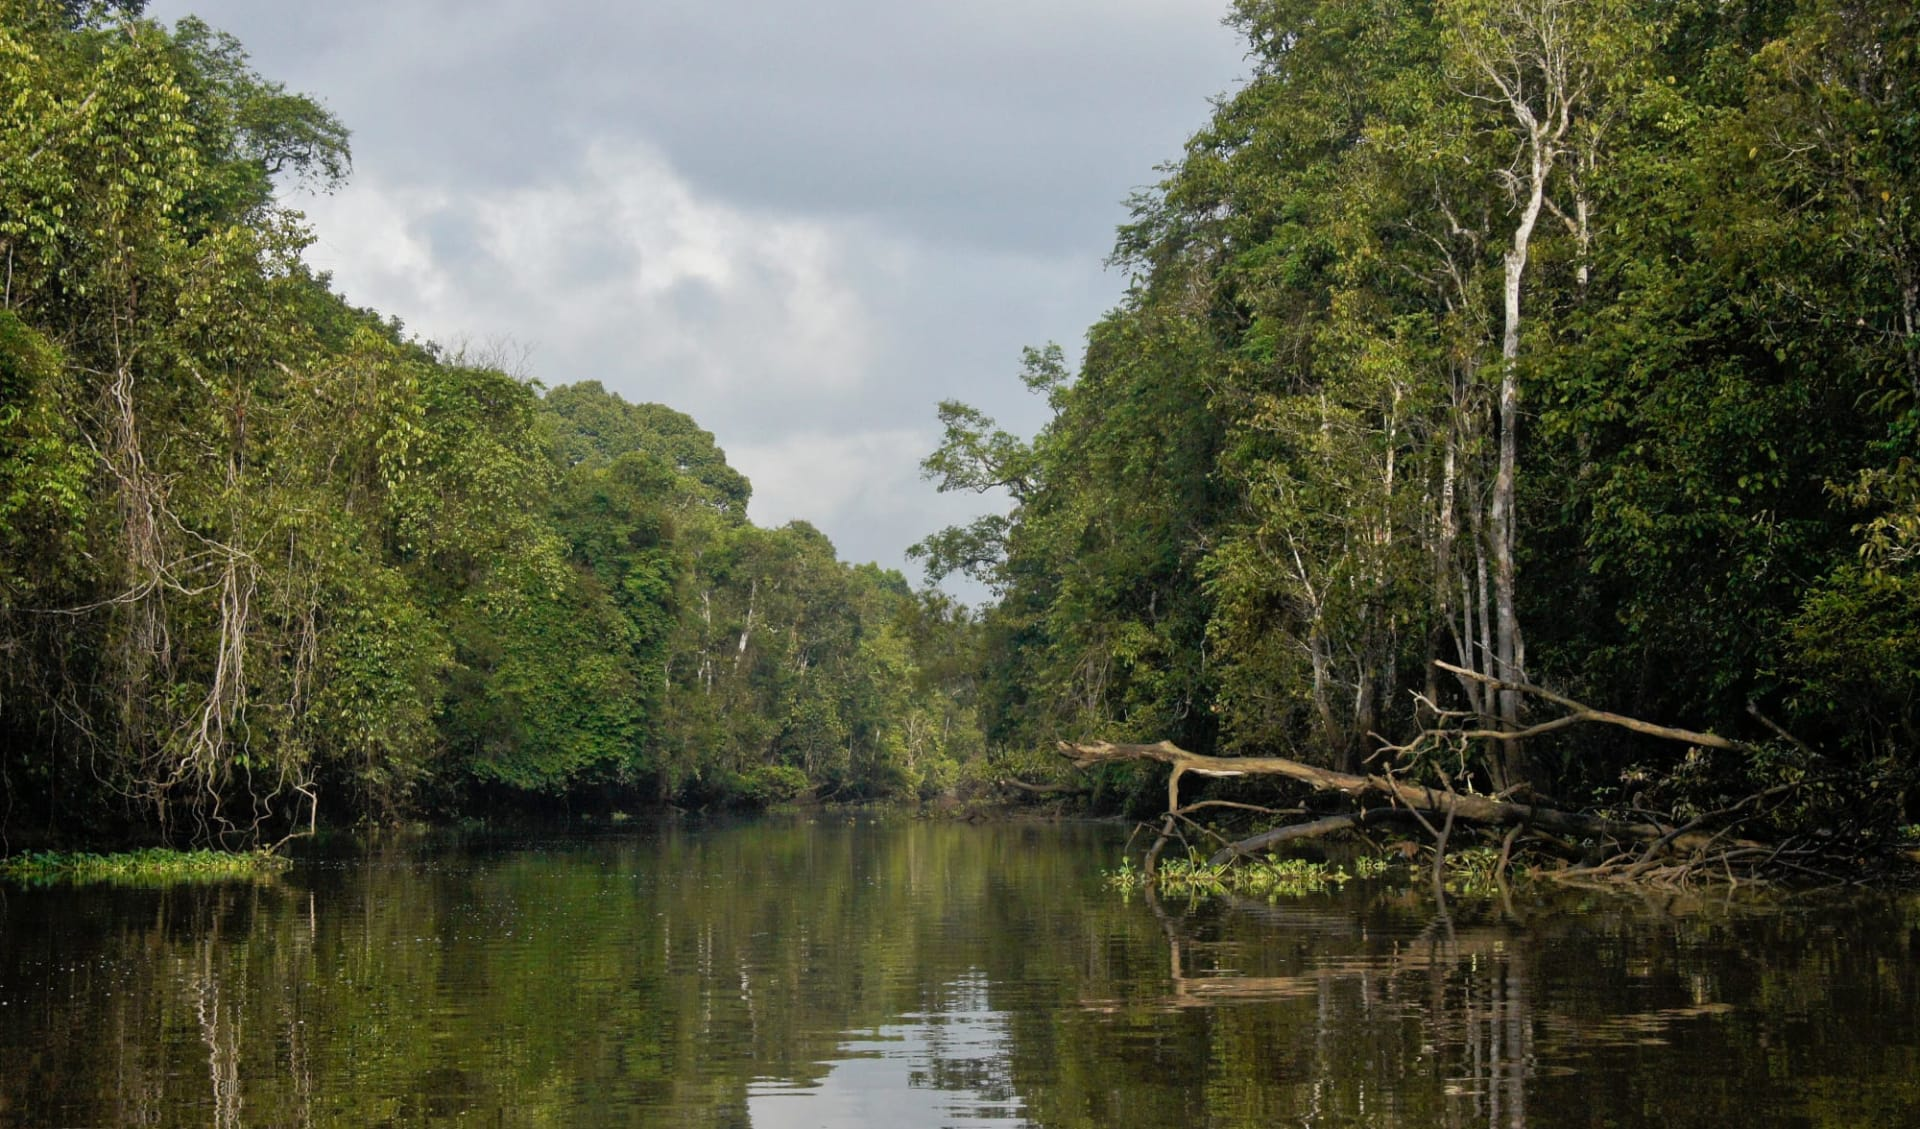 Borneo Wildlife / Borneo Rainforest Lodge ab Kota Kinabalu: Kinabatangan River